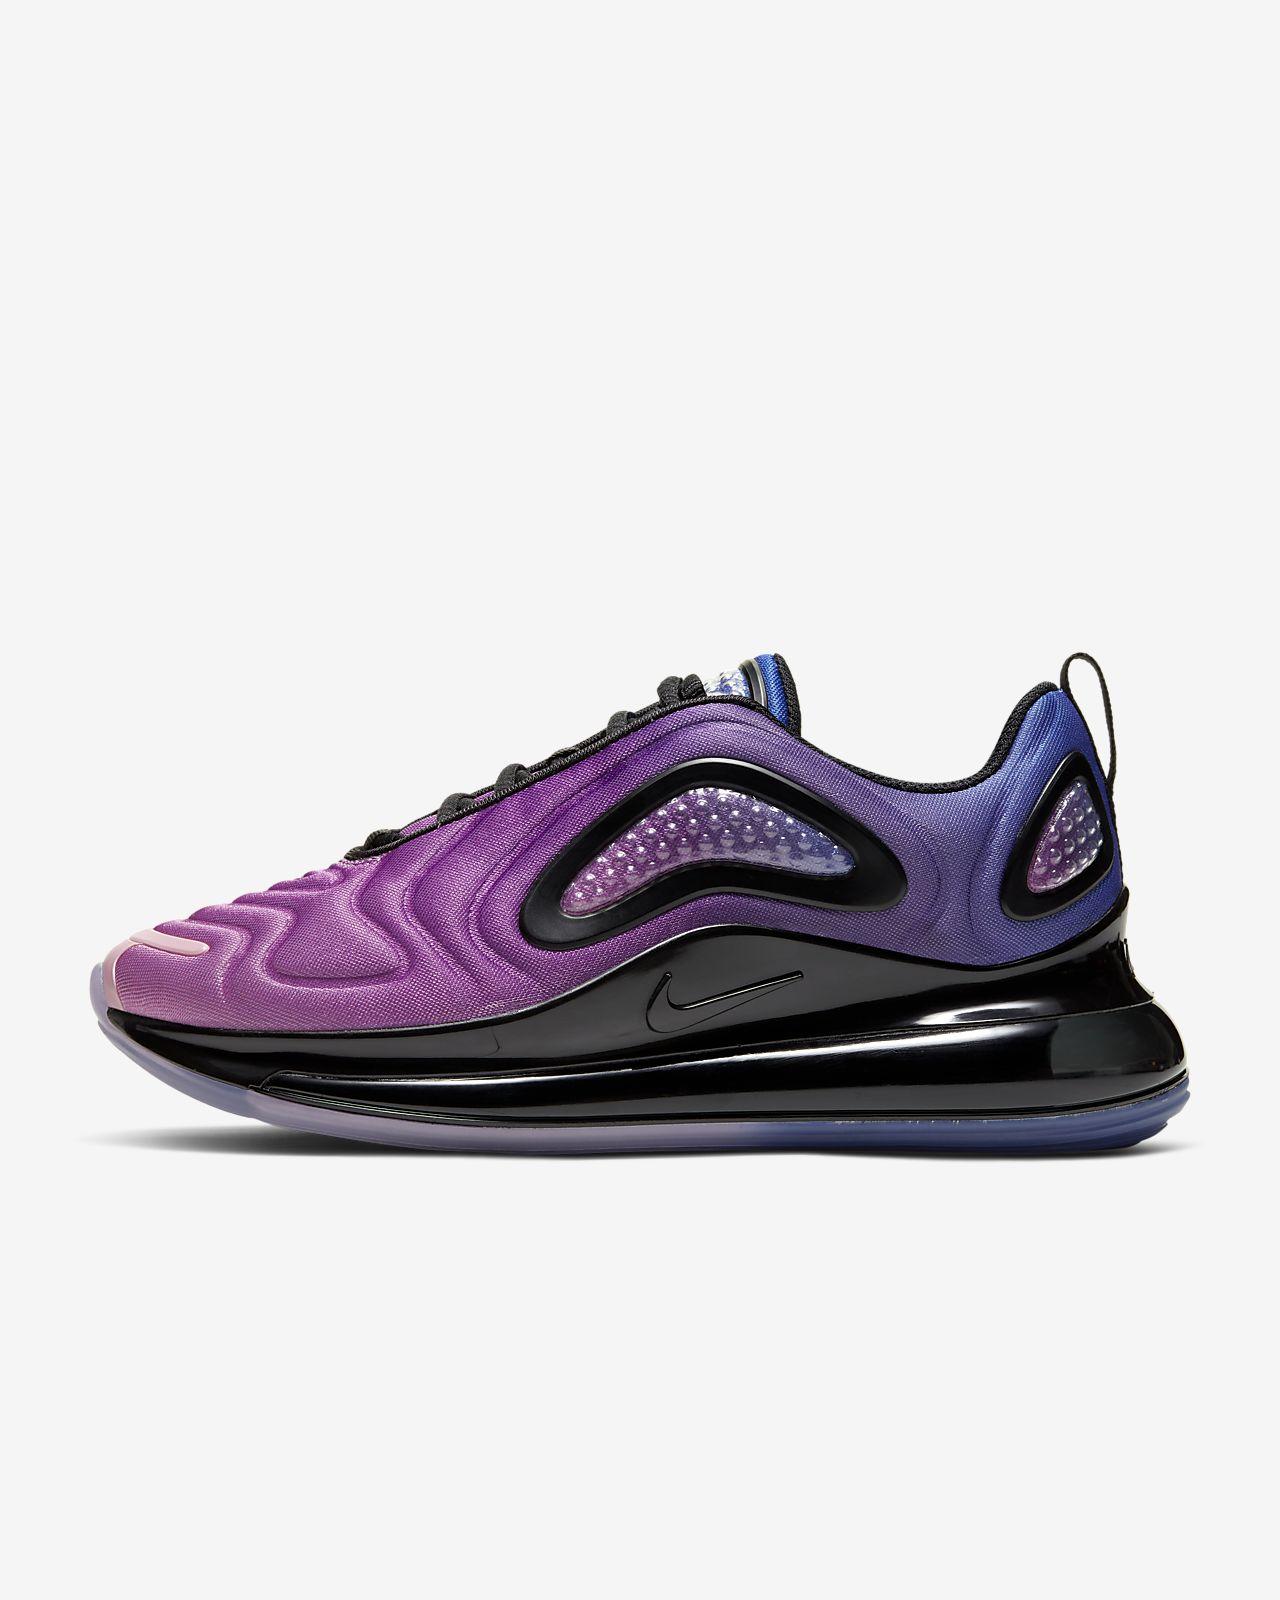 Chaussure Nike Air Max 720 SE pour Femme